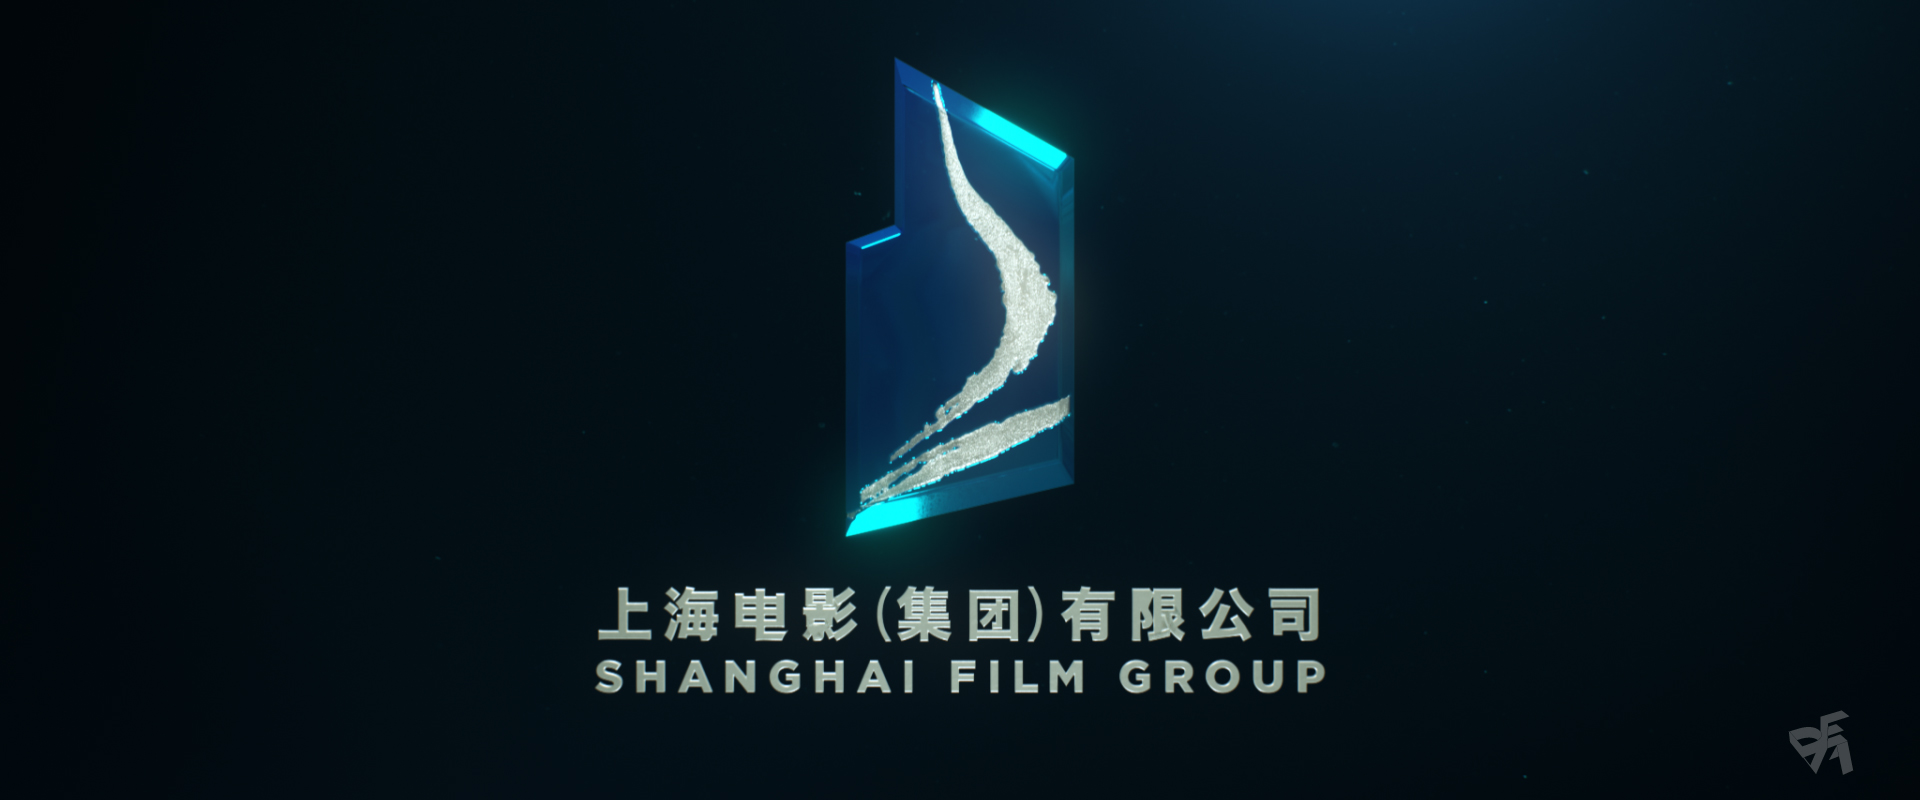 ShanghaiFilmGroup_STYLEFRAME_01.jpg